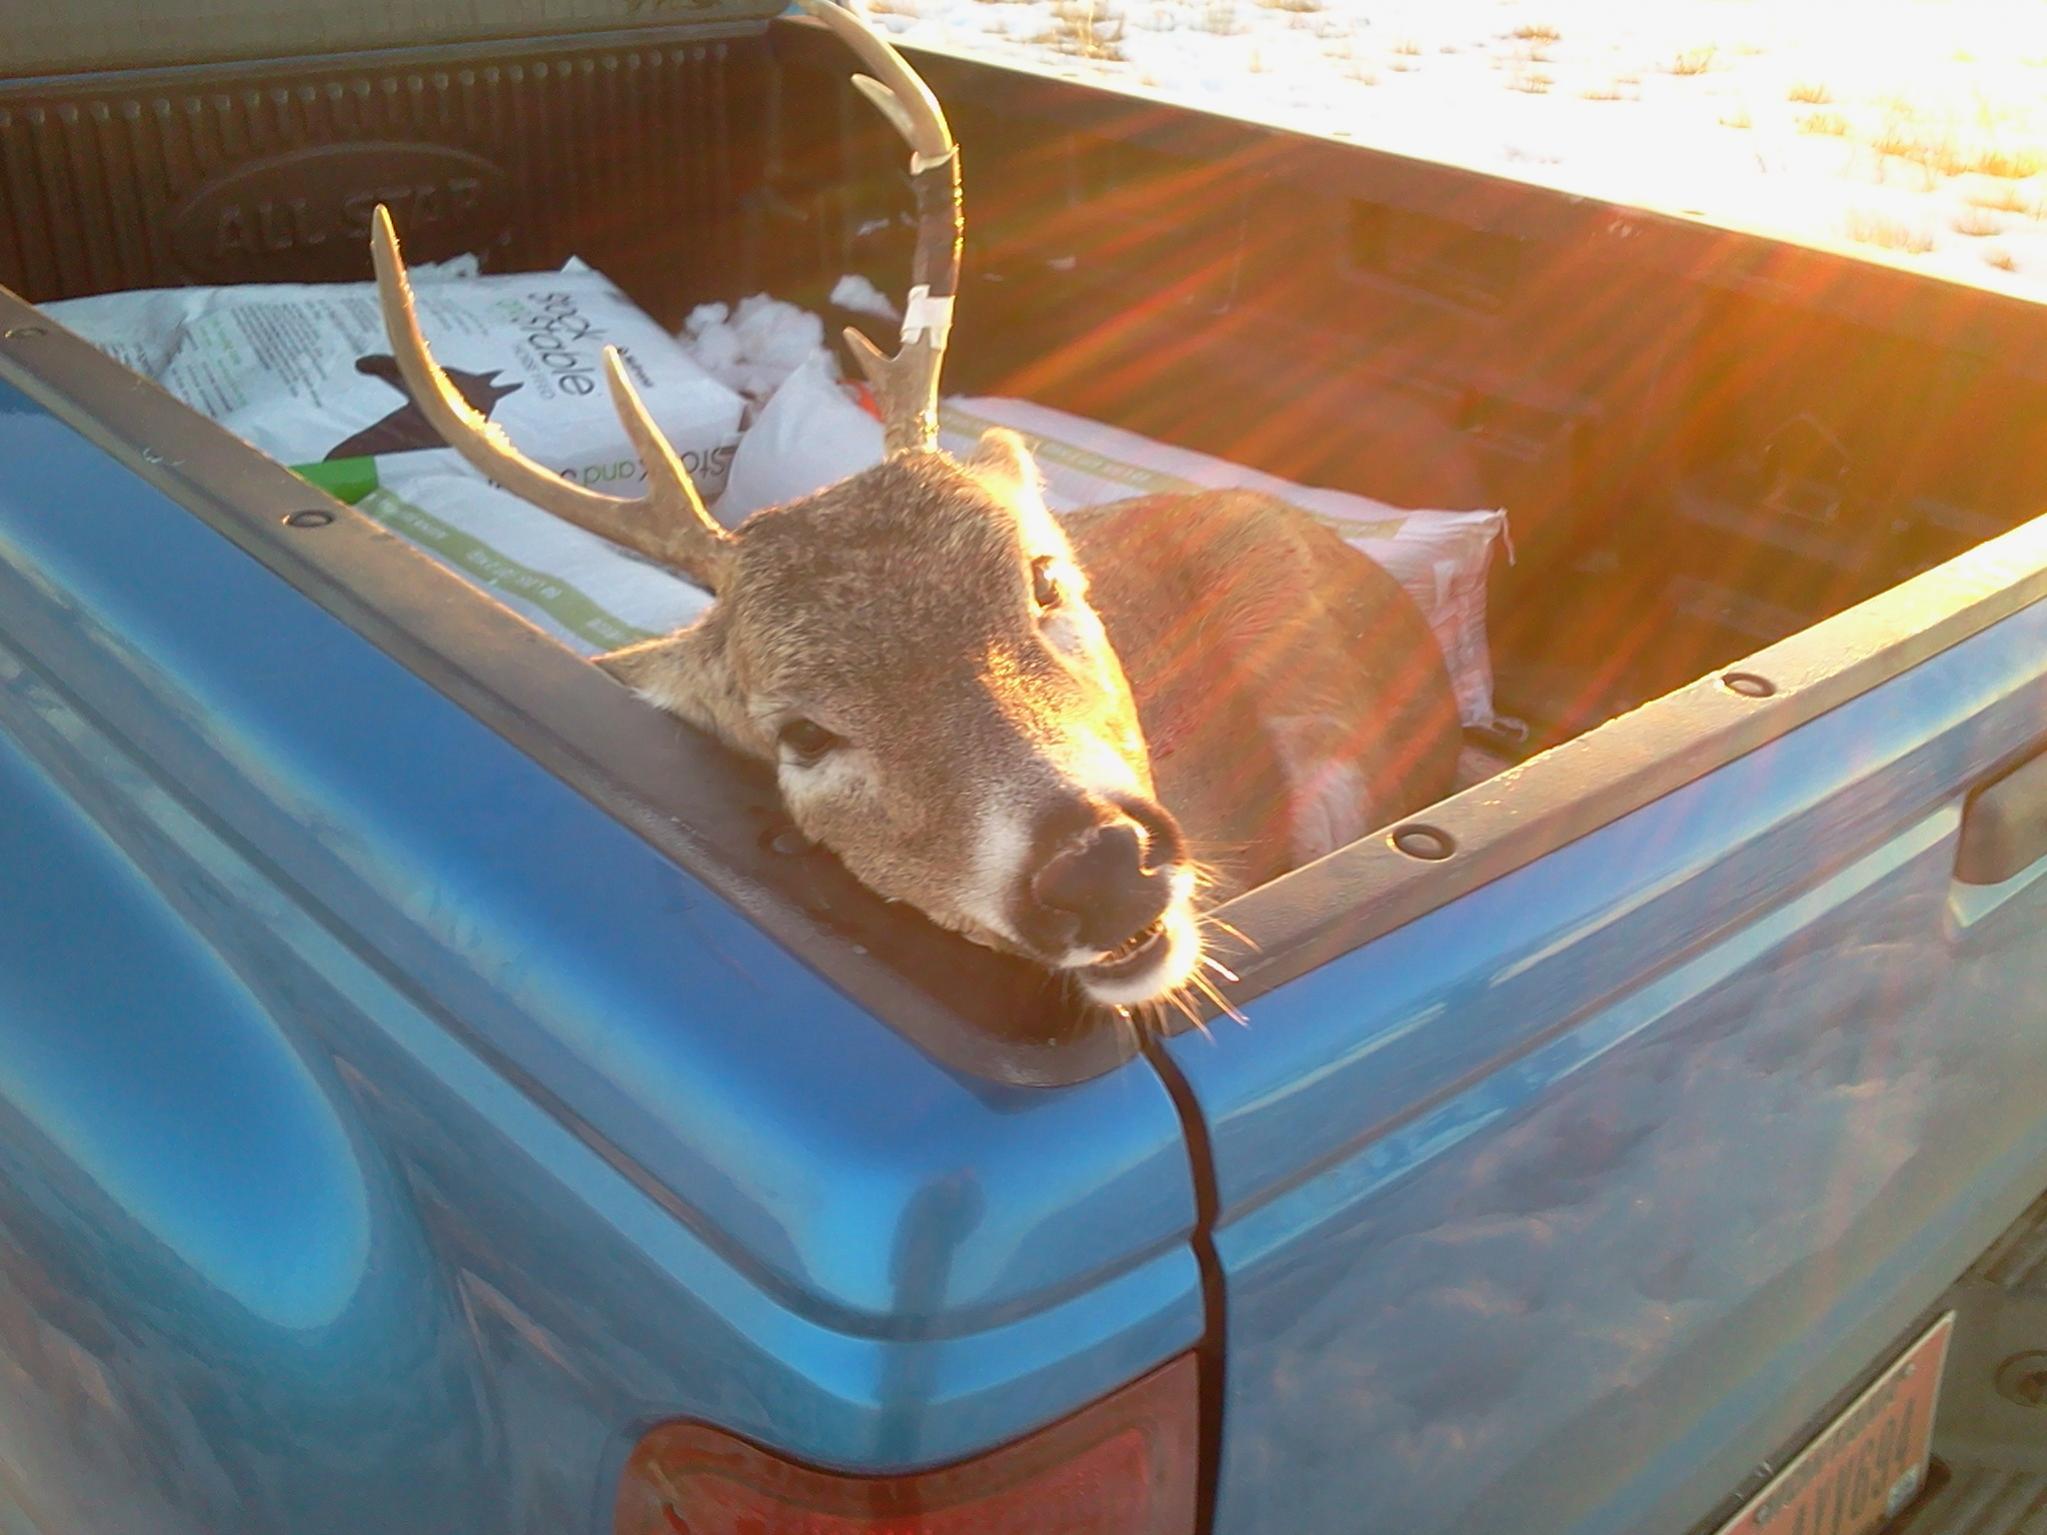 Went Deer Huntin' Again...-2012-11-15-16.17.45.jpg